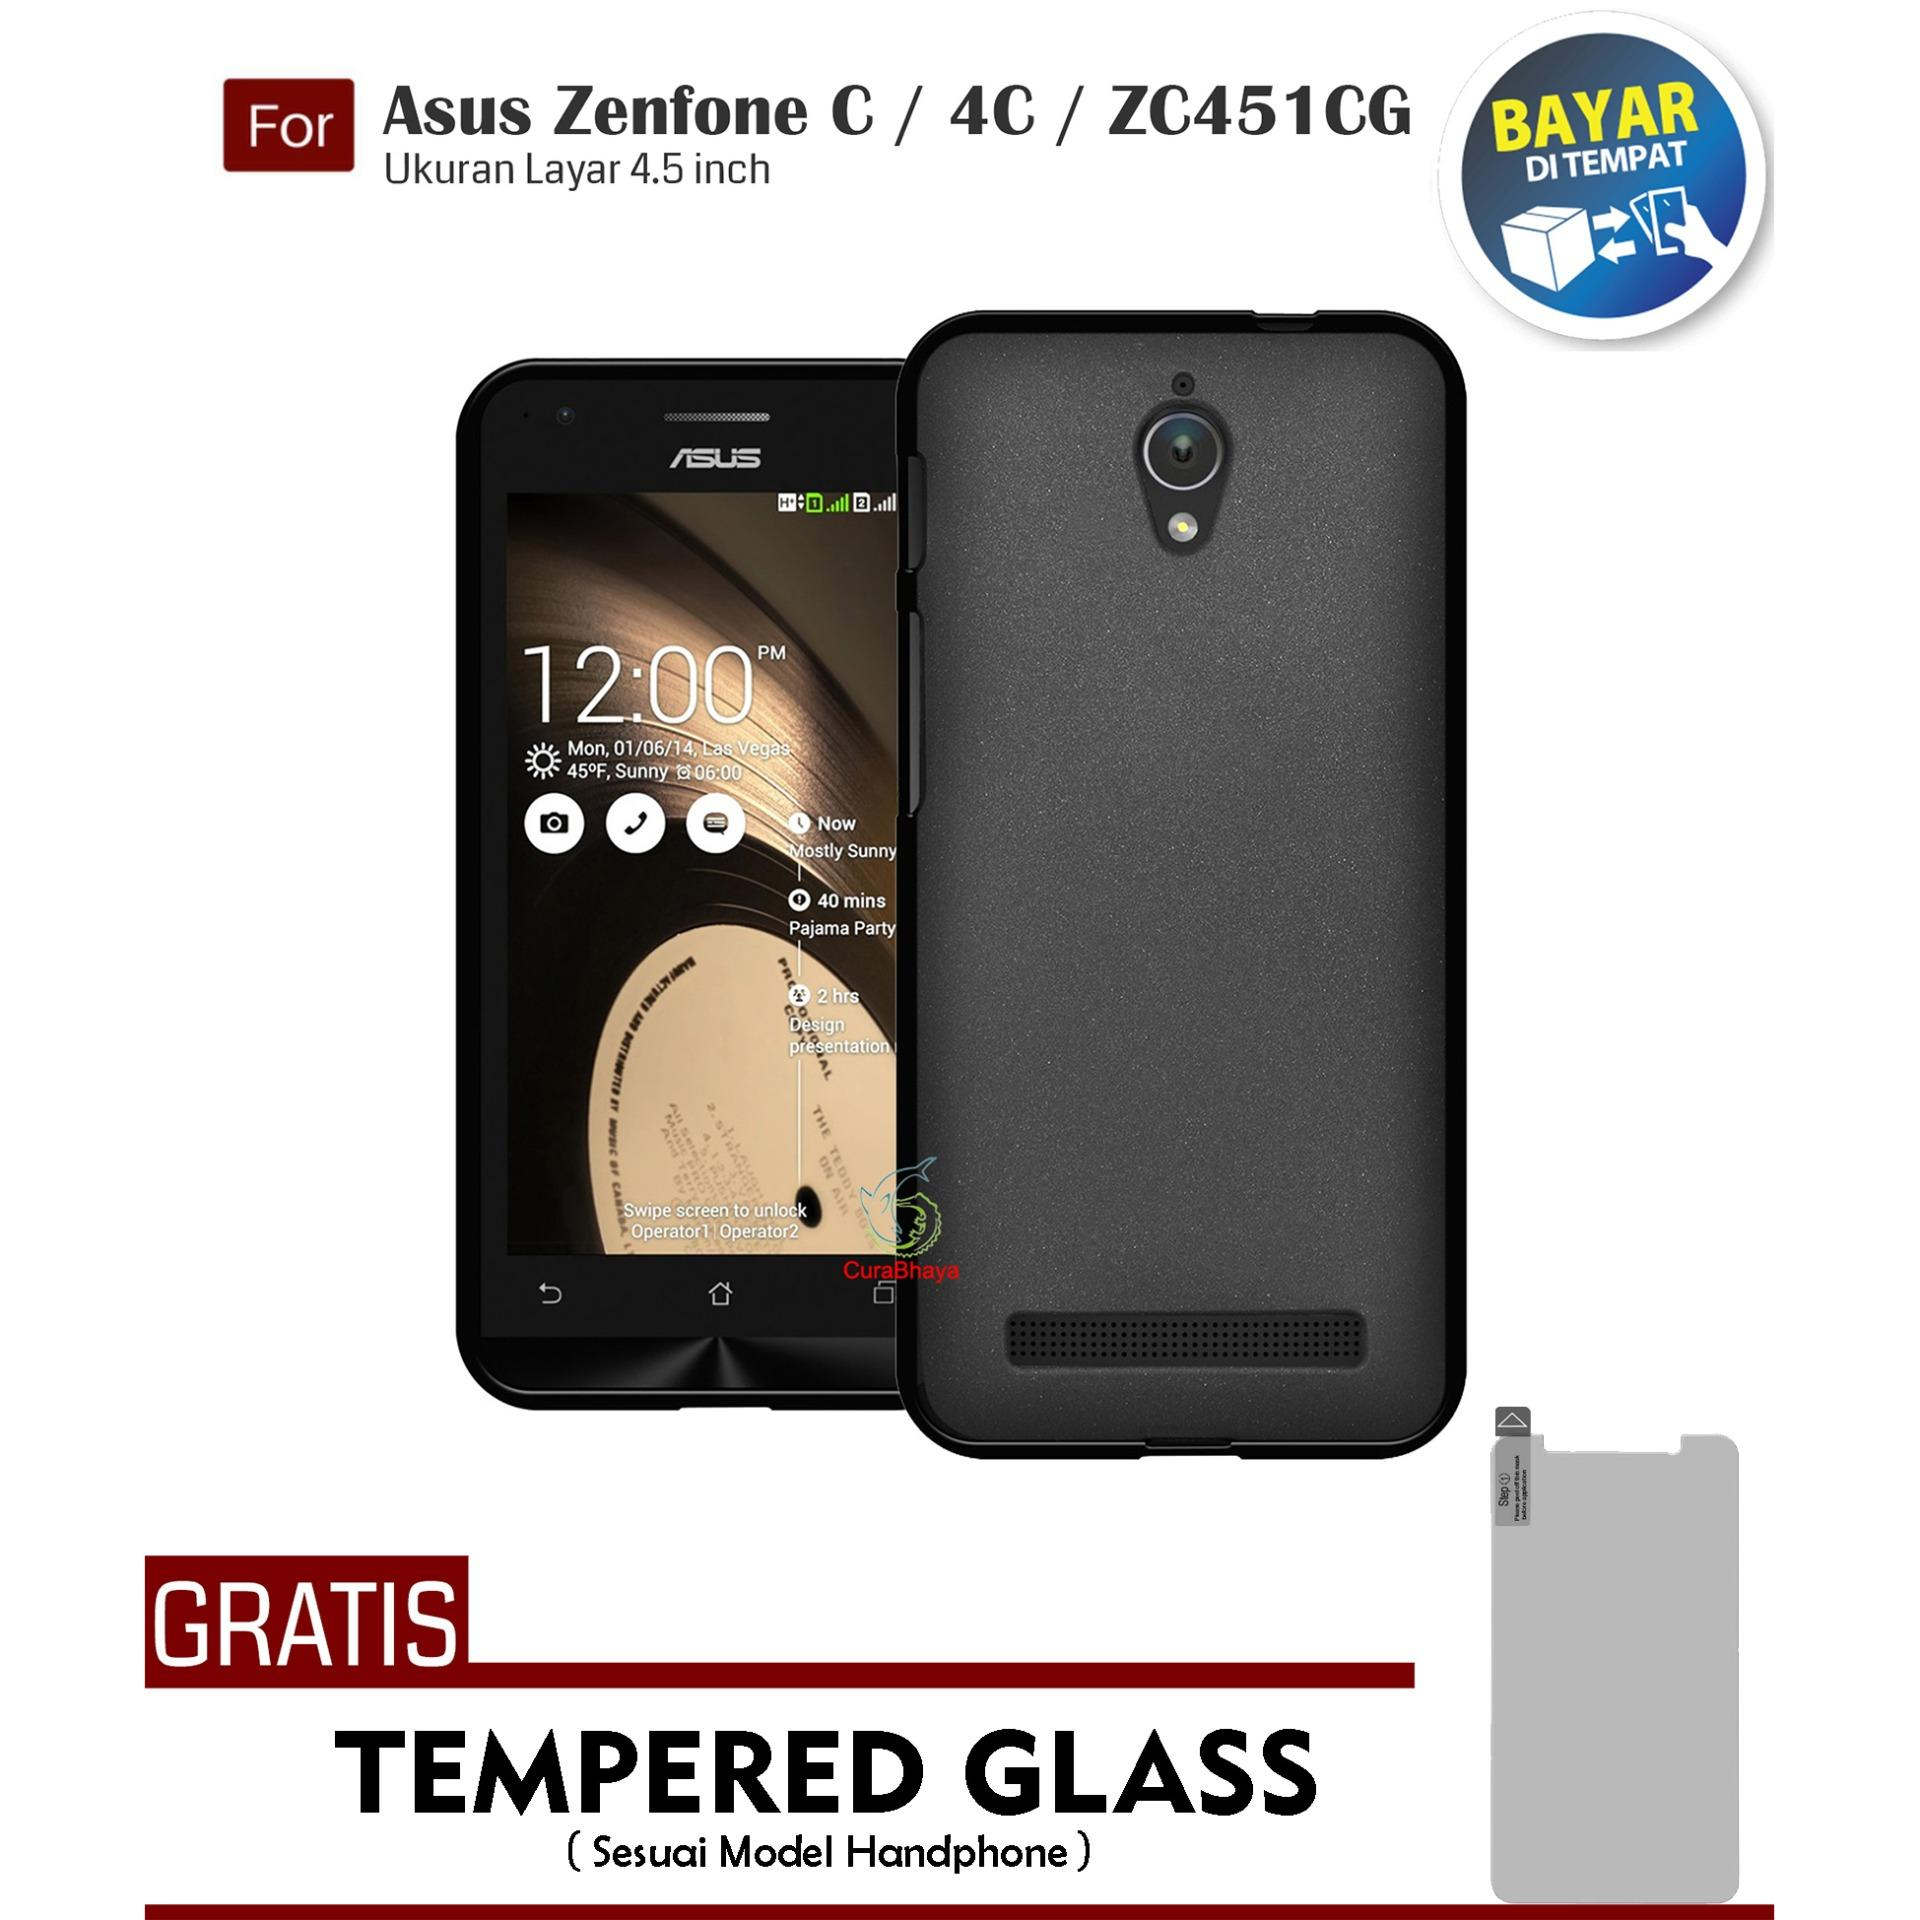 MidNight Asus Zenfone C / 4C / ZC451CG | Slim Case Black Matte Softcase Premium Baby Skin + Gratis Free Tempered Glass Screen Protector